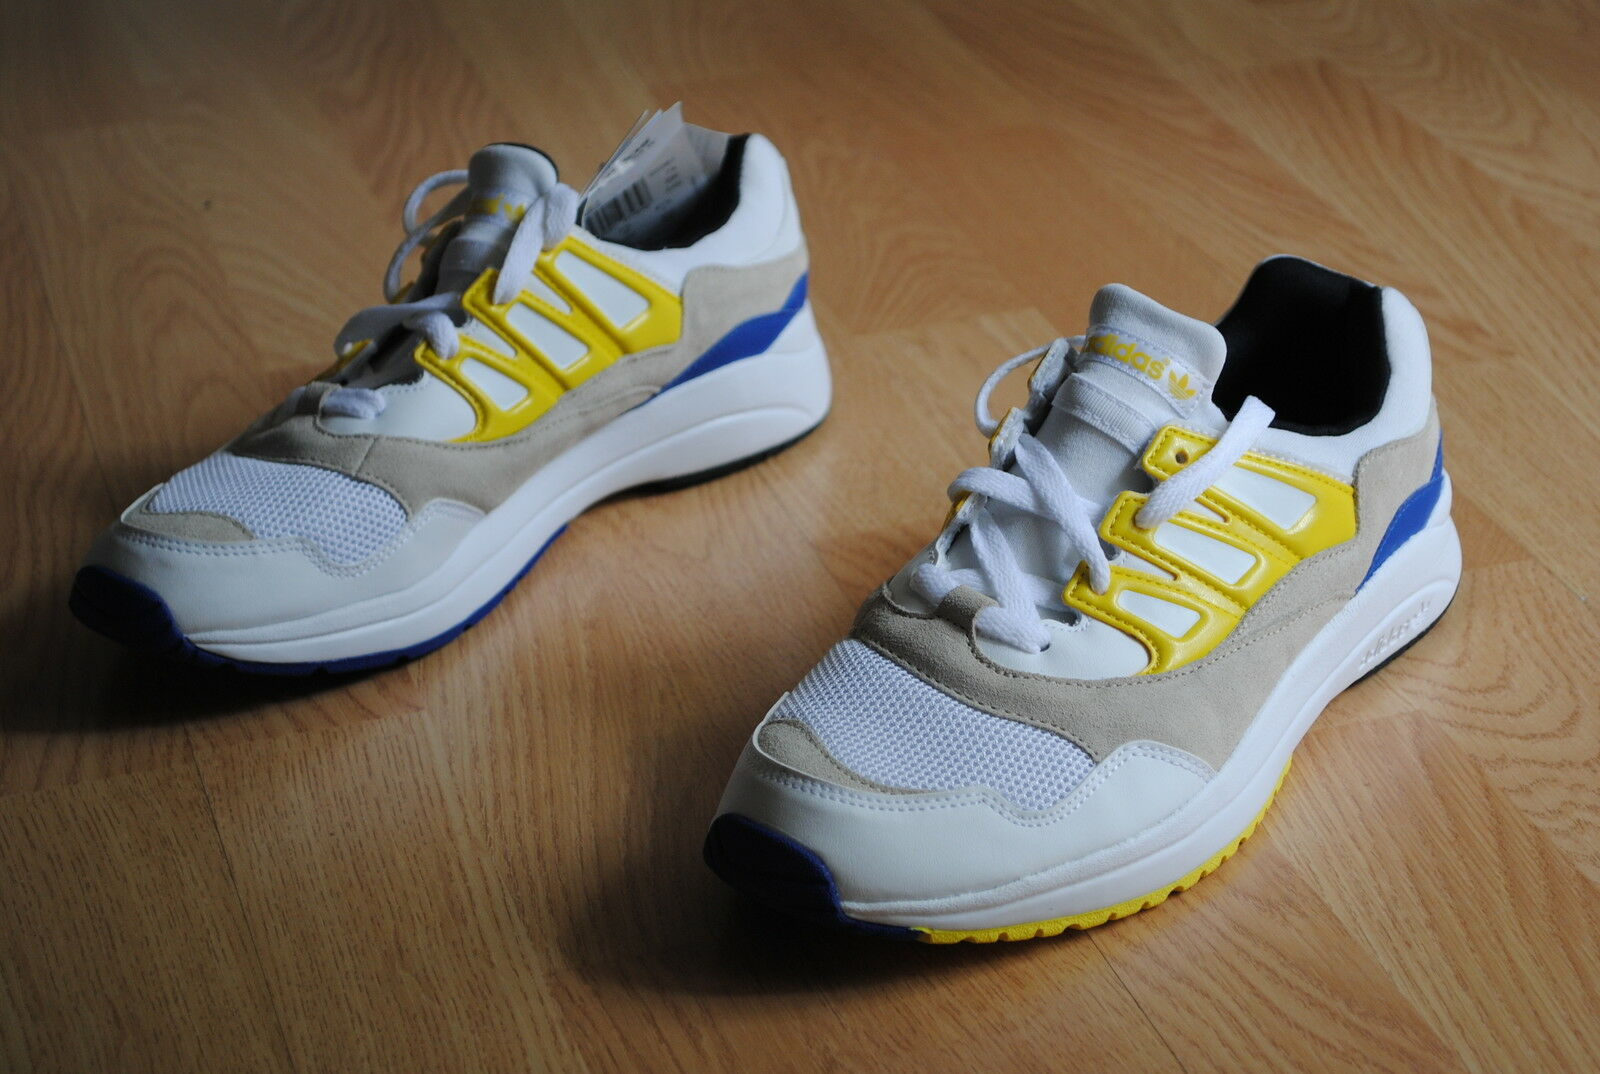 adidas Torsion Allegra W 36,5 37 38,5 40 41  Vintage zx adistaR la trainer